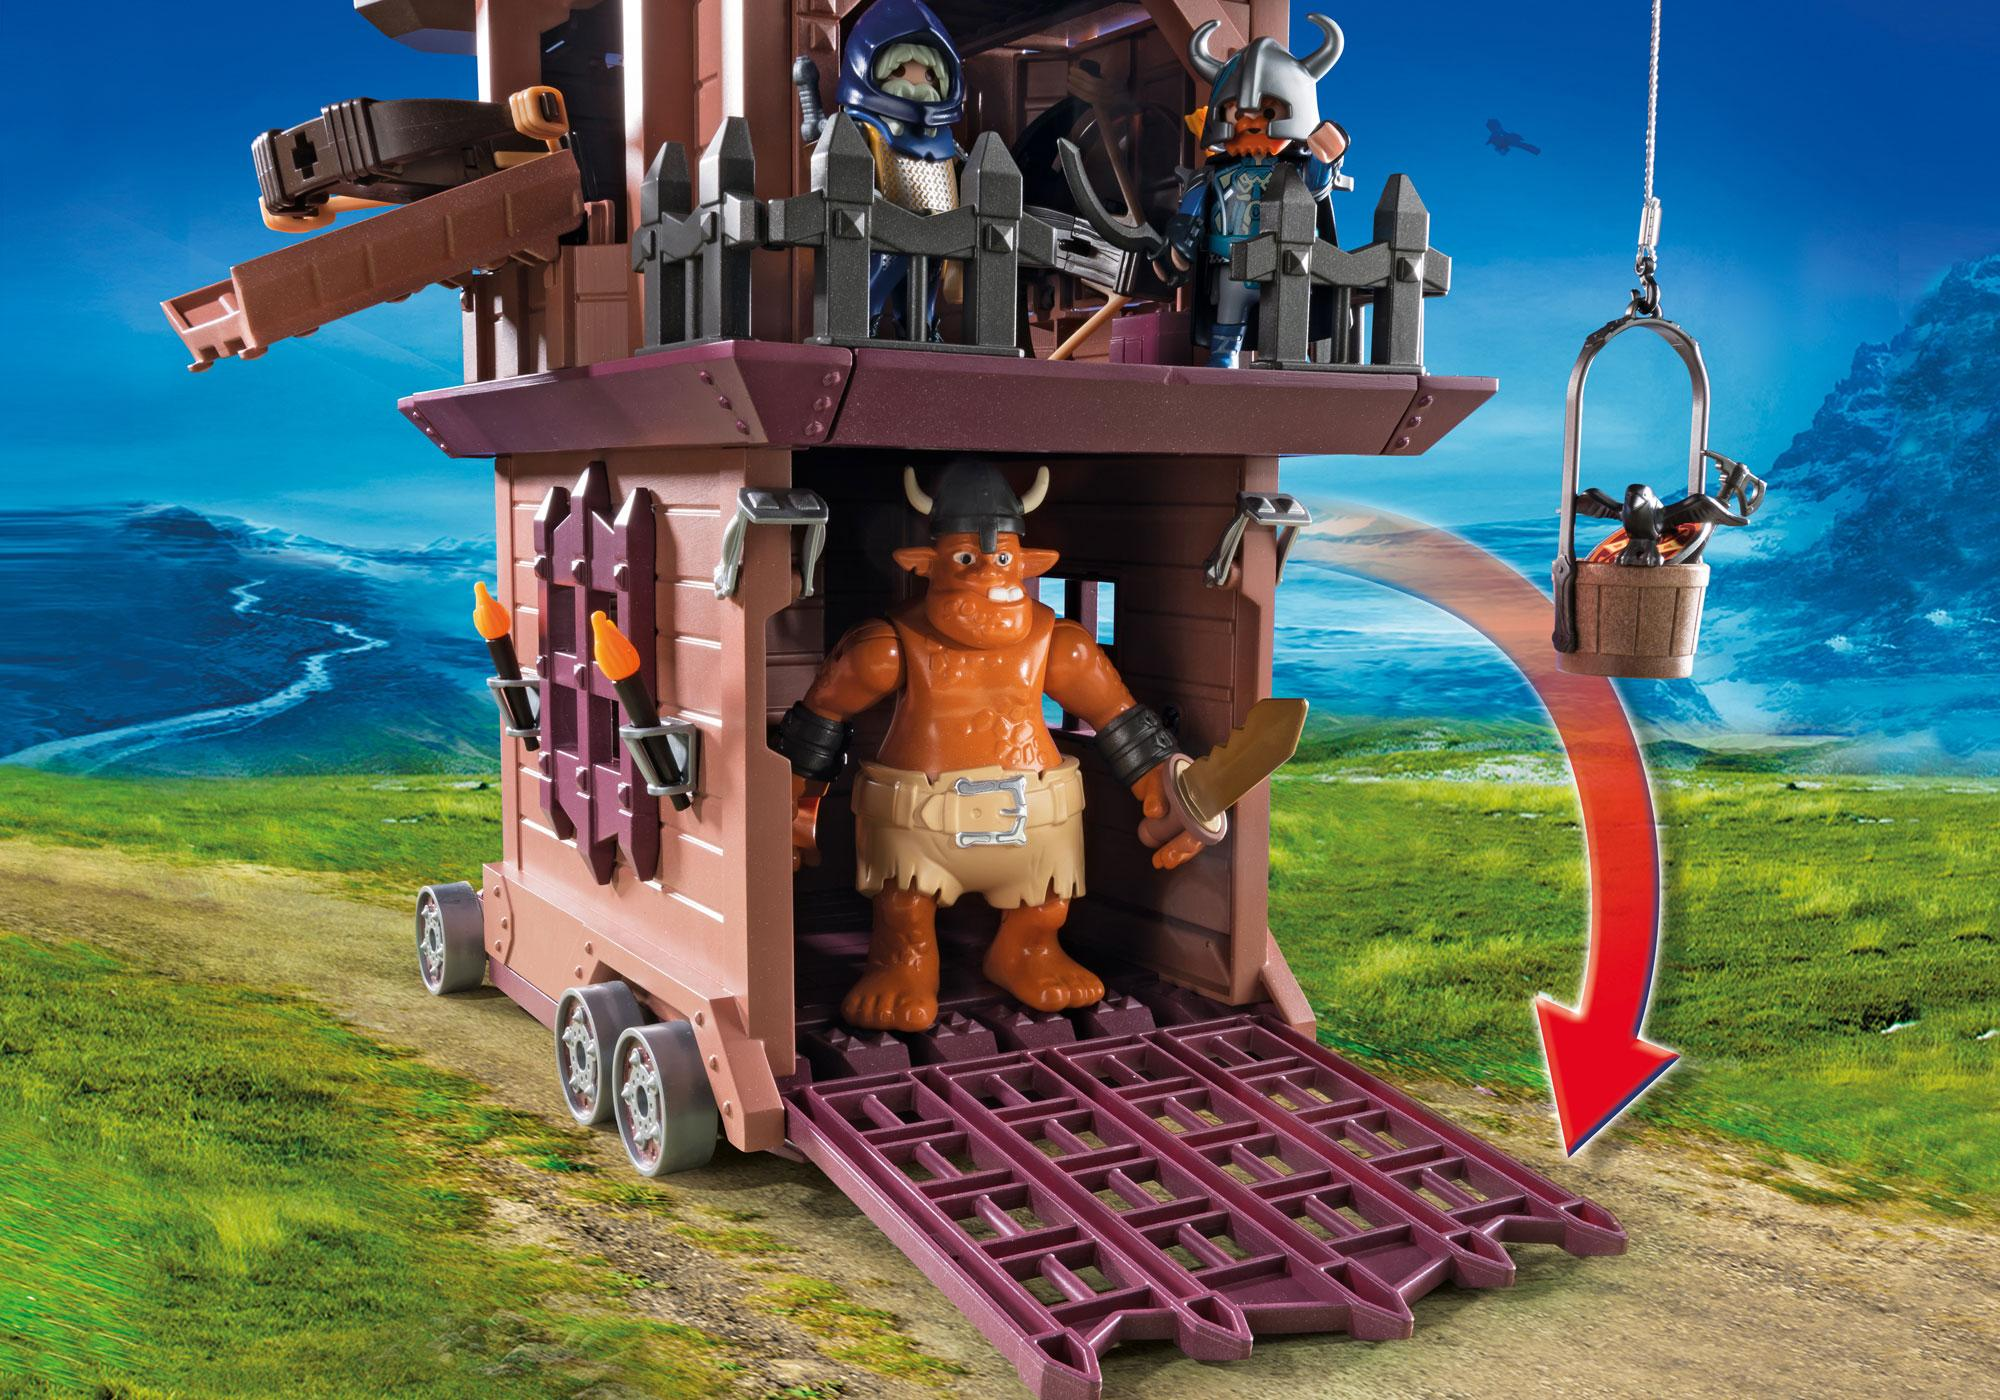 http://media.playmobil.com/i/playmobil/9340_product_extra1